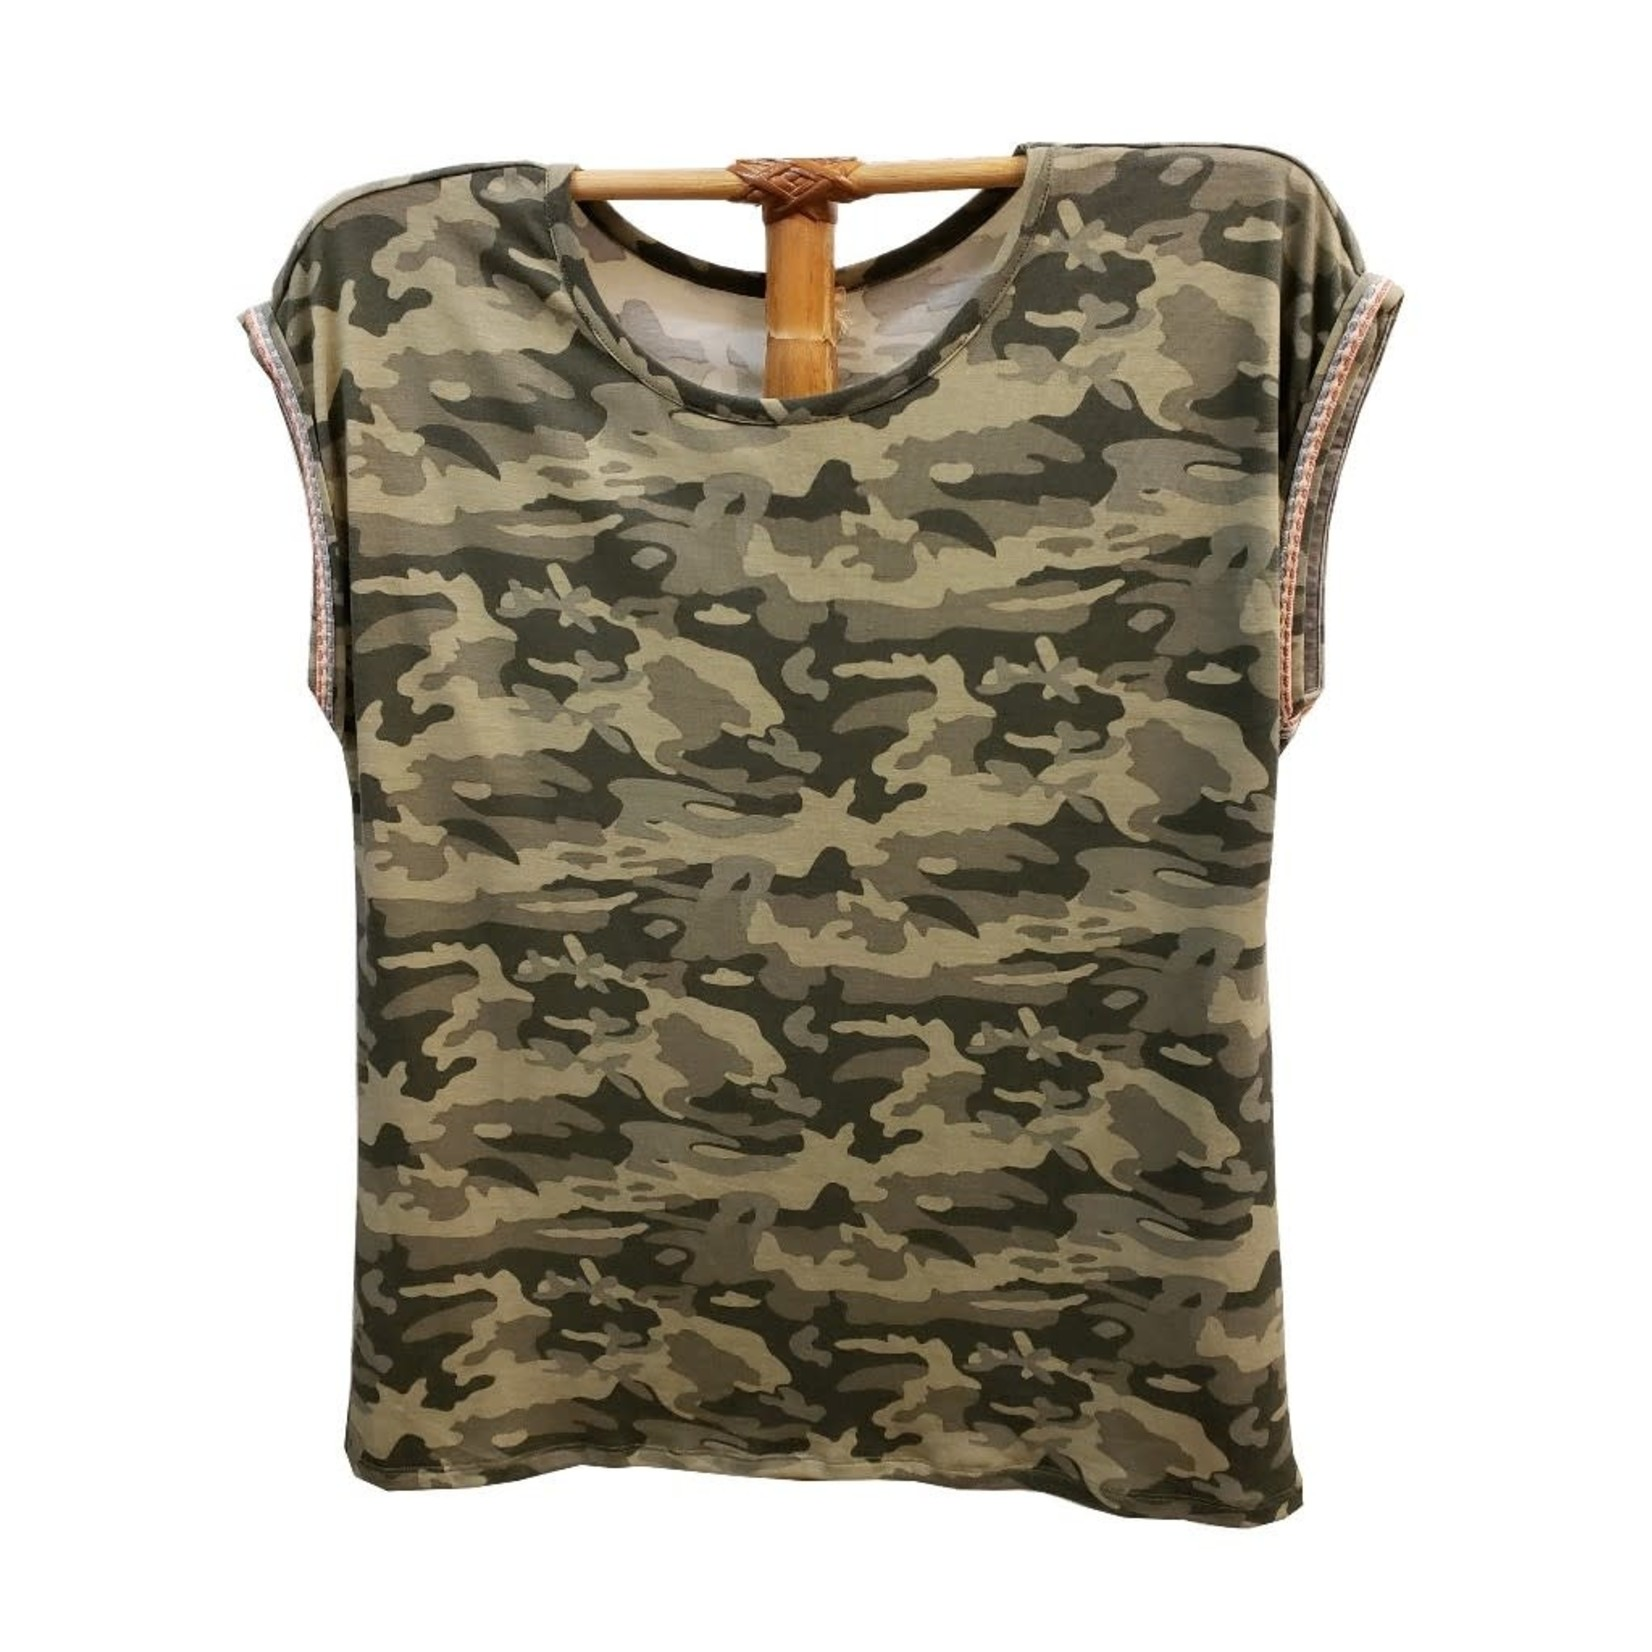 Hem & Thread Camo Tee Shirt w/ Trim